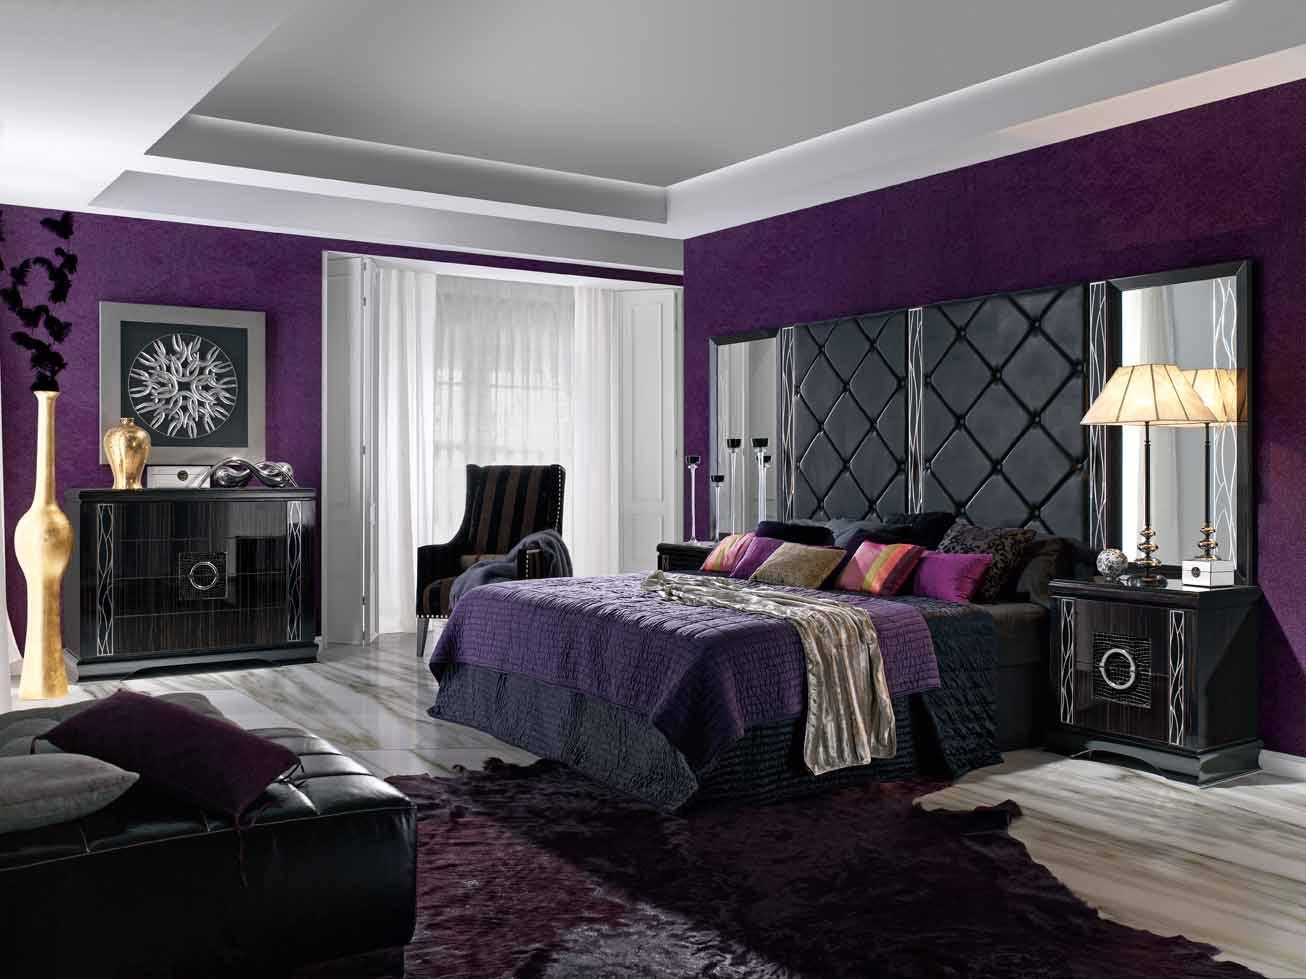 dormitorios de matrimonio de estilo clasico (28)